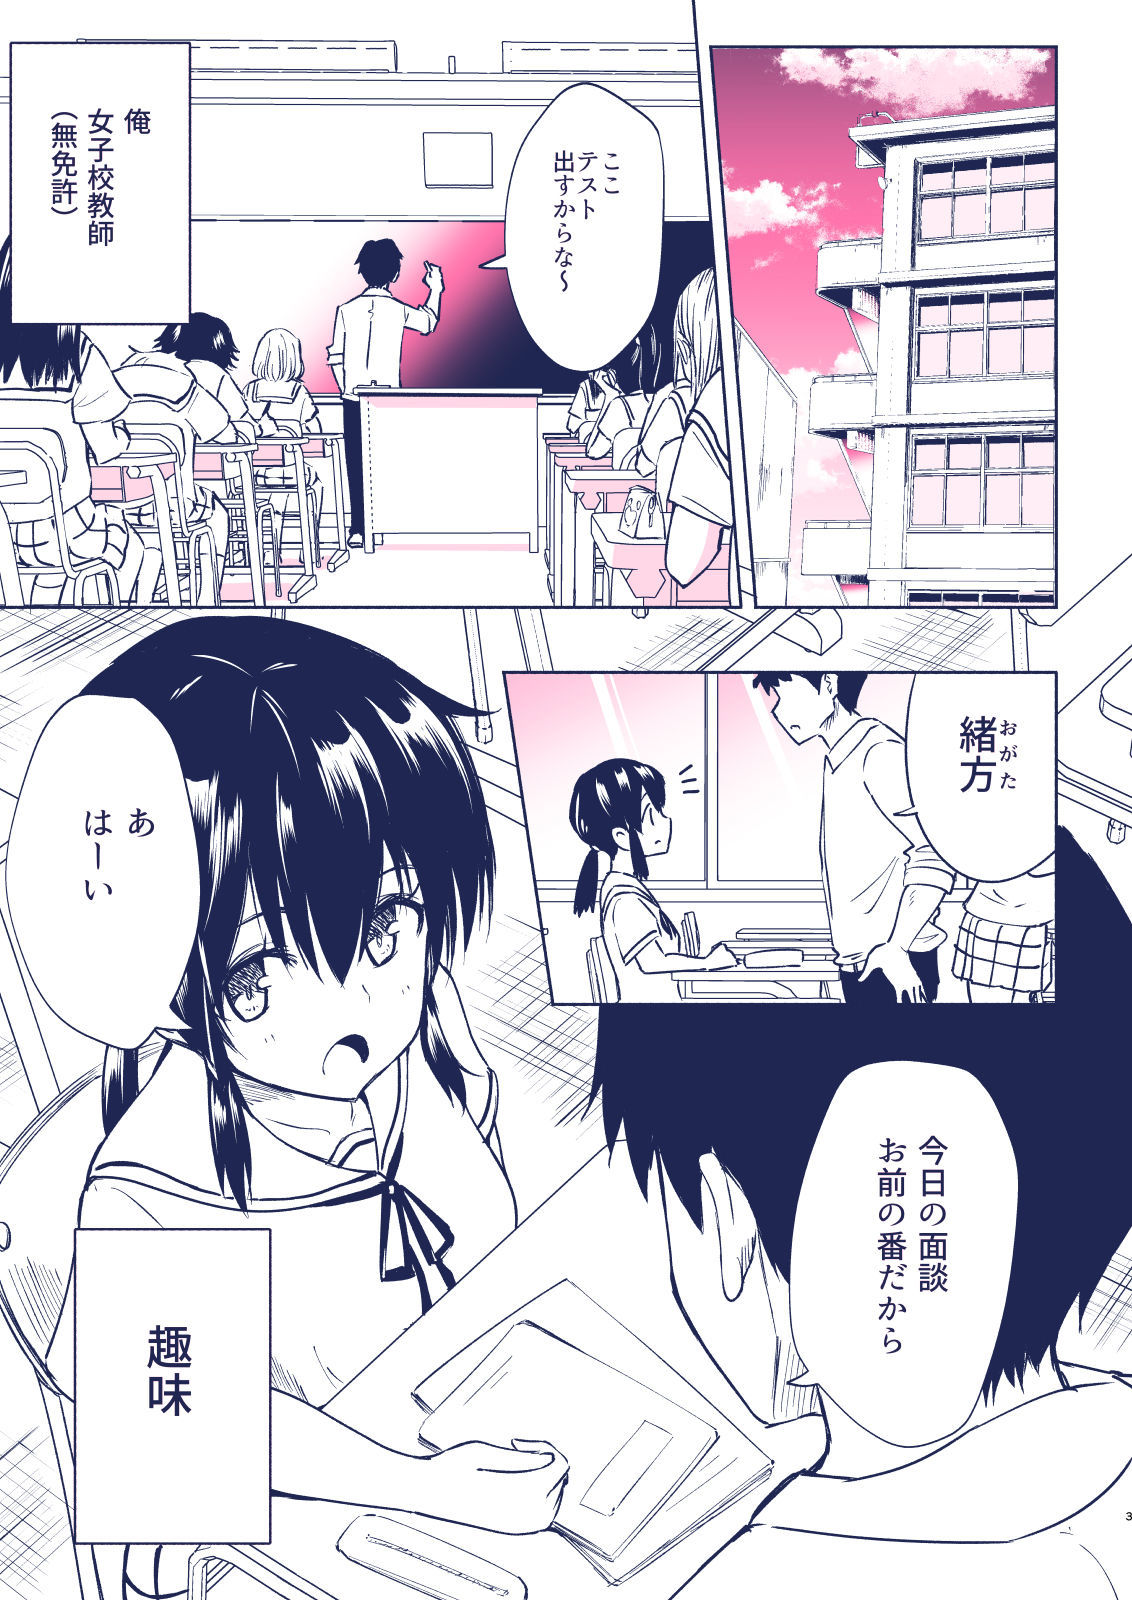 FANZA同人【セックススマートフォン~ハーレム学園編4~】